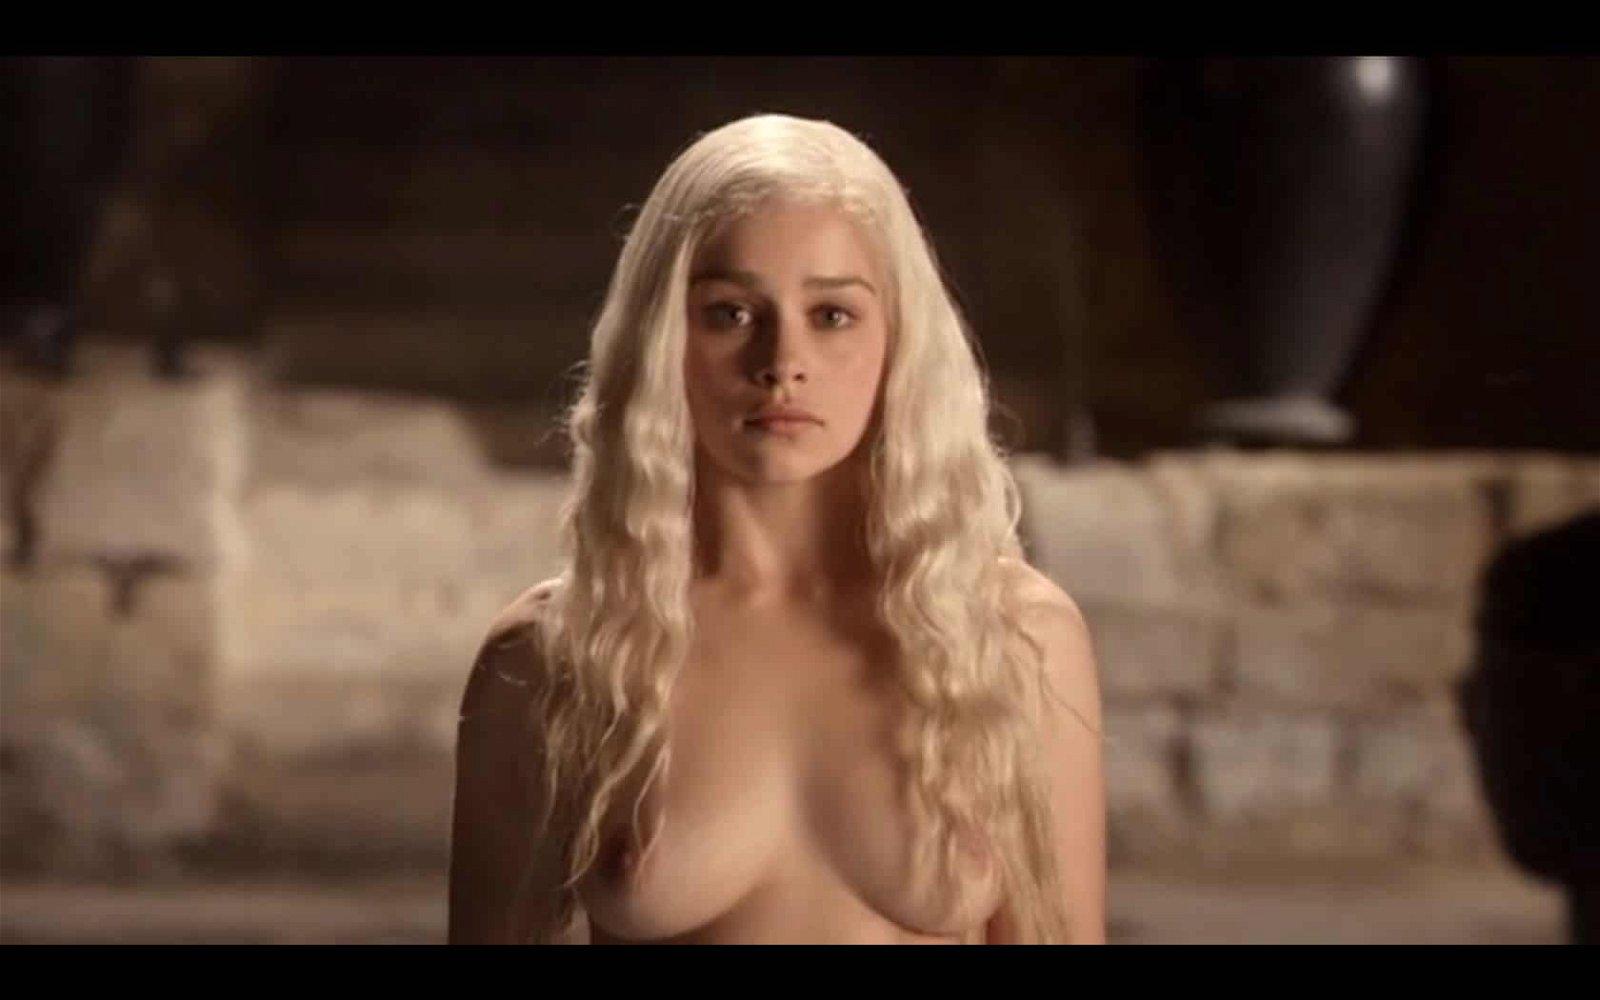 Emilia Clarke blond hair covering nipples